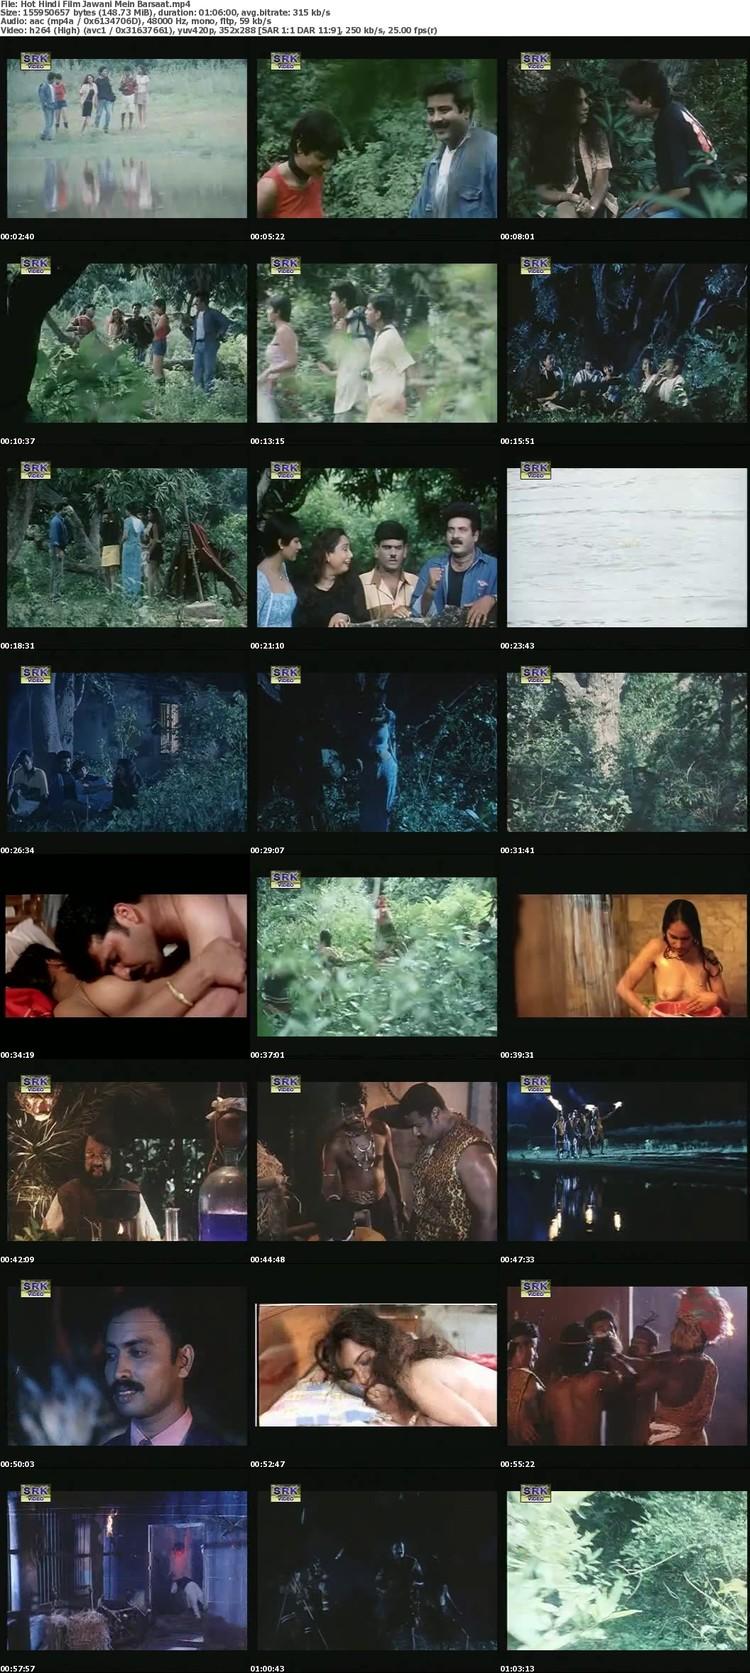 [Image: Hot%20Hindi%20Film%20Jawani%20Mein%20Bar...humb_l.jpg]